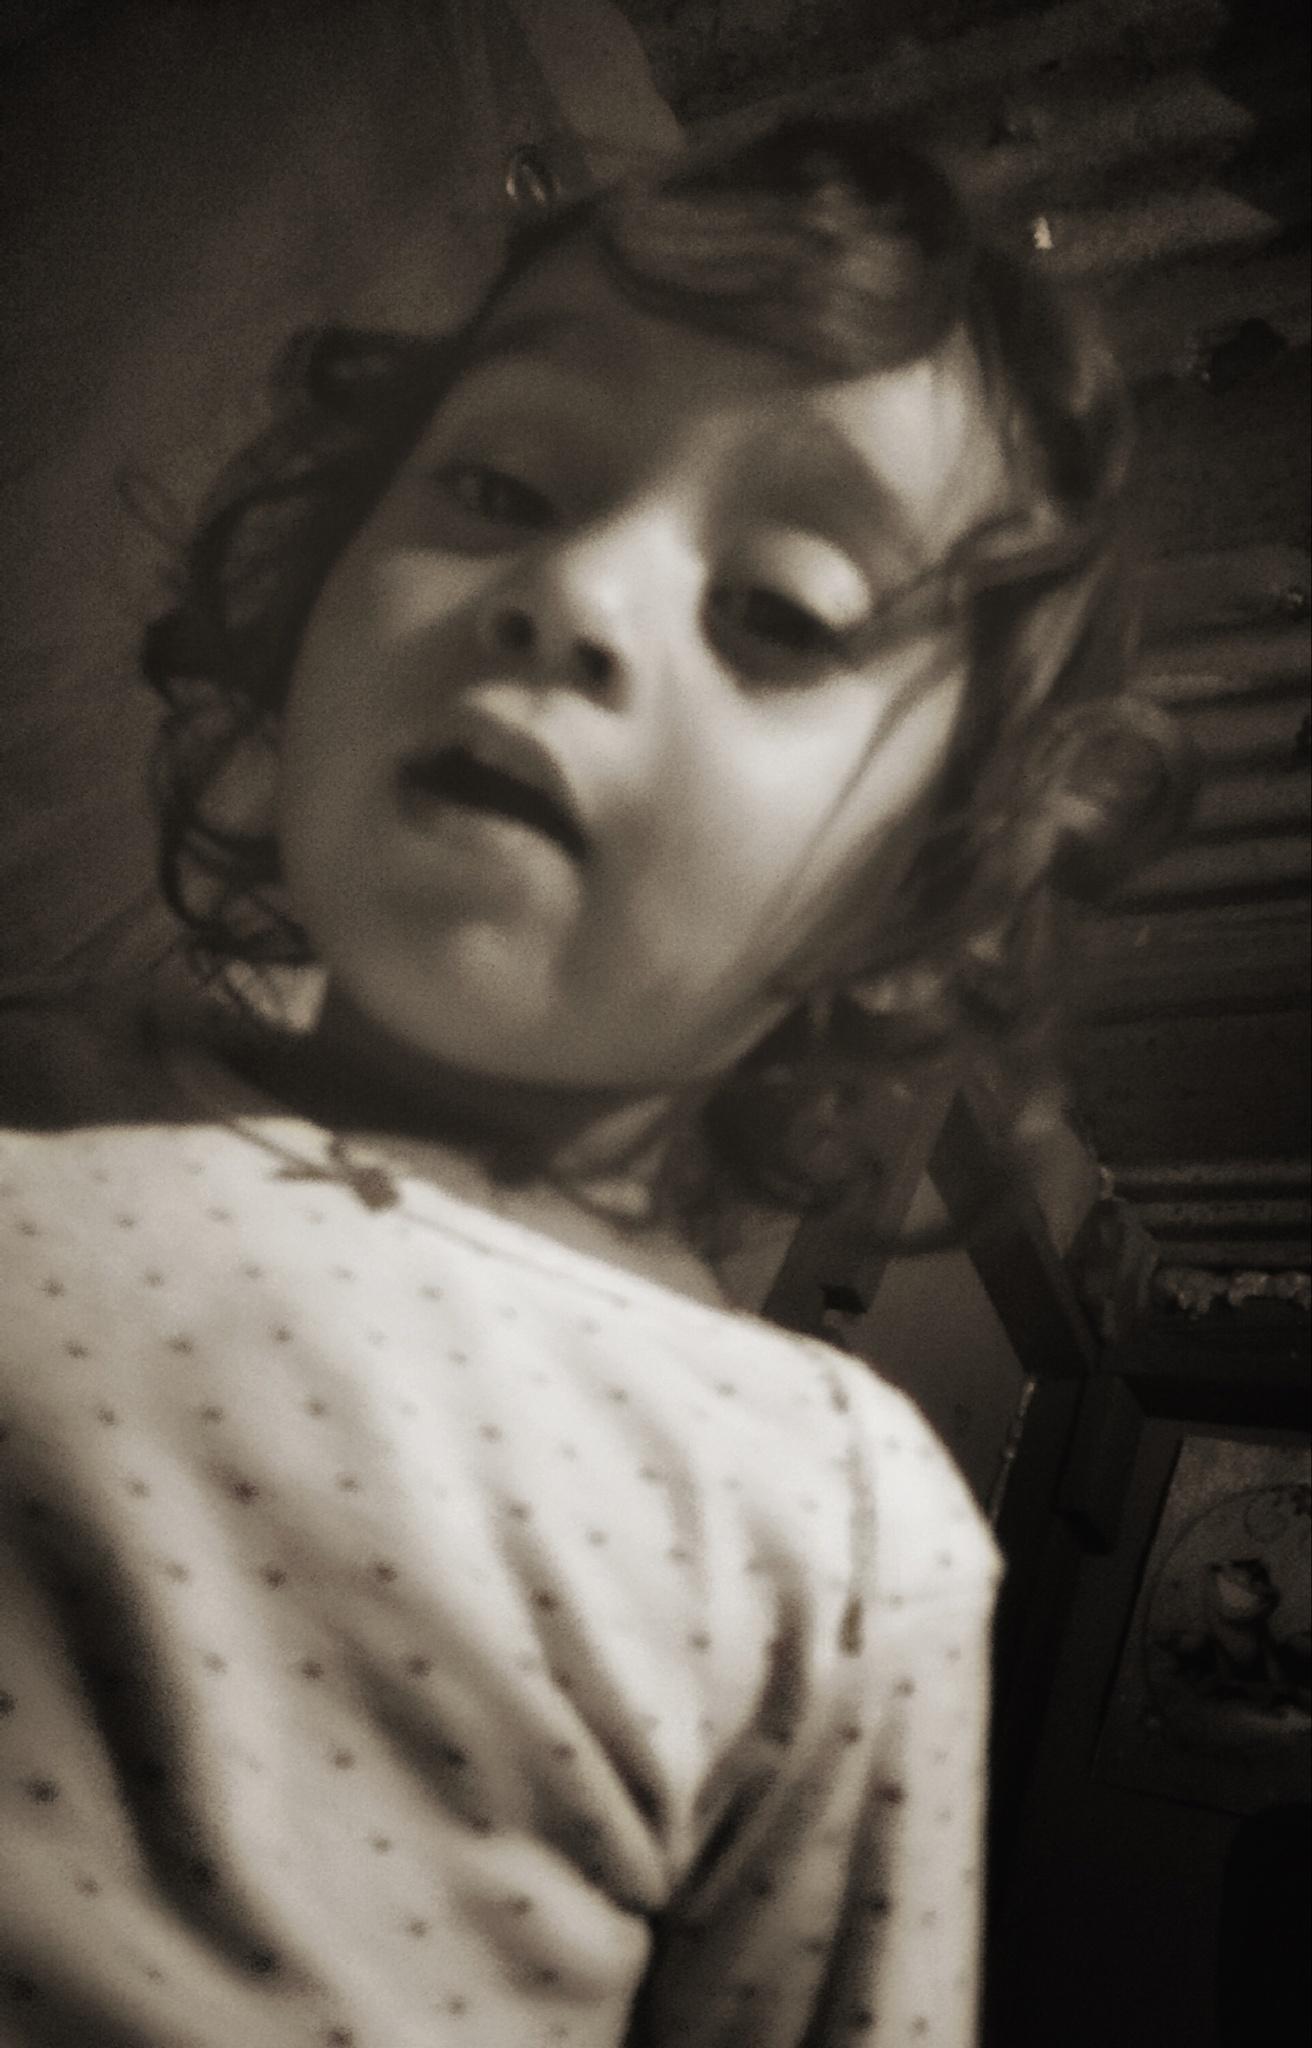 Baby Natania❤️ by Nilda64pr